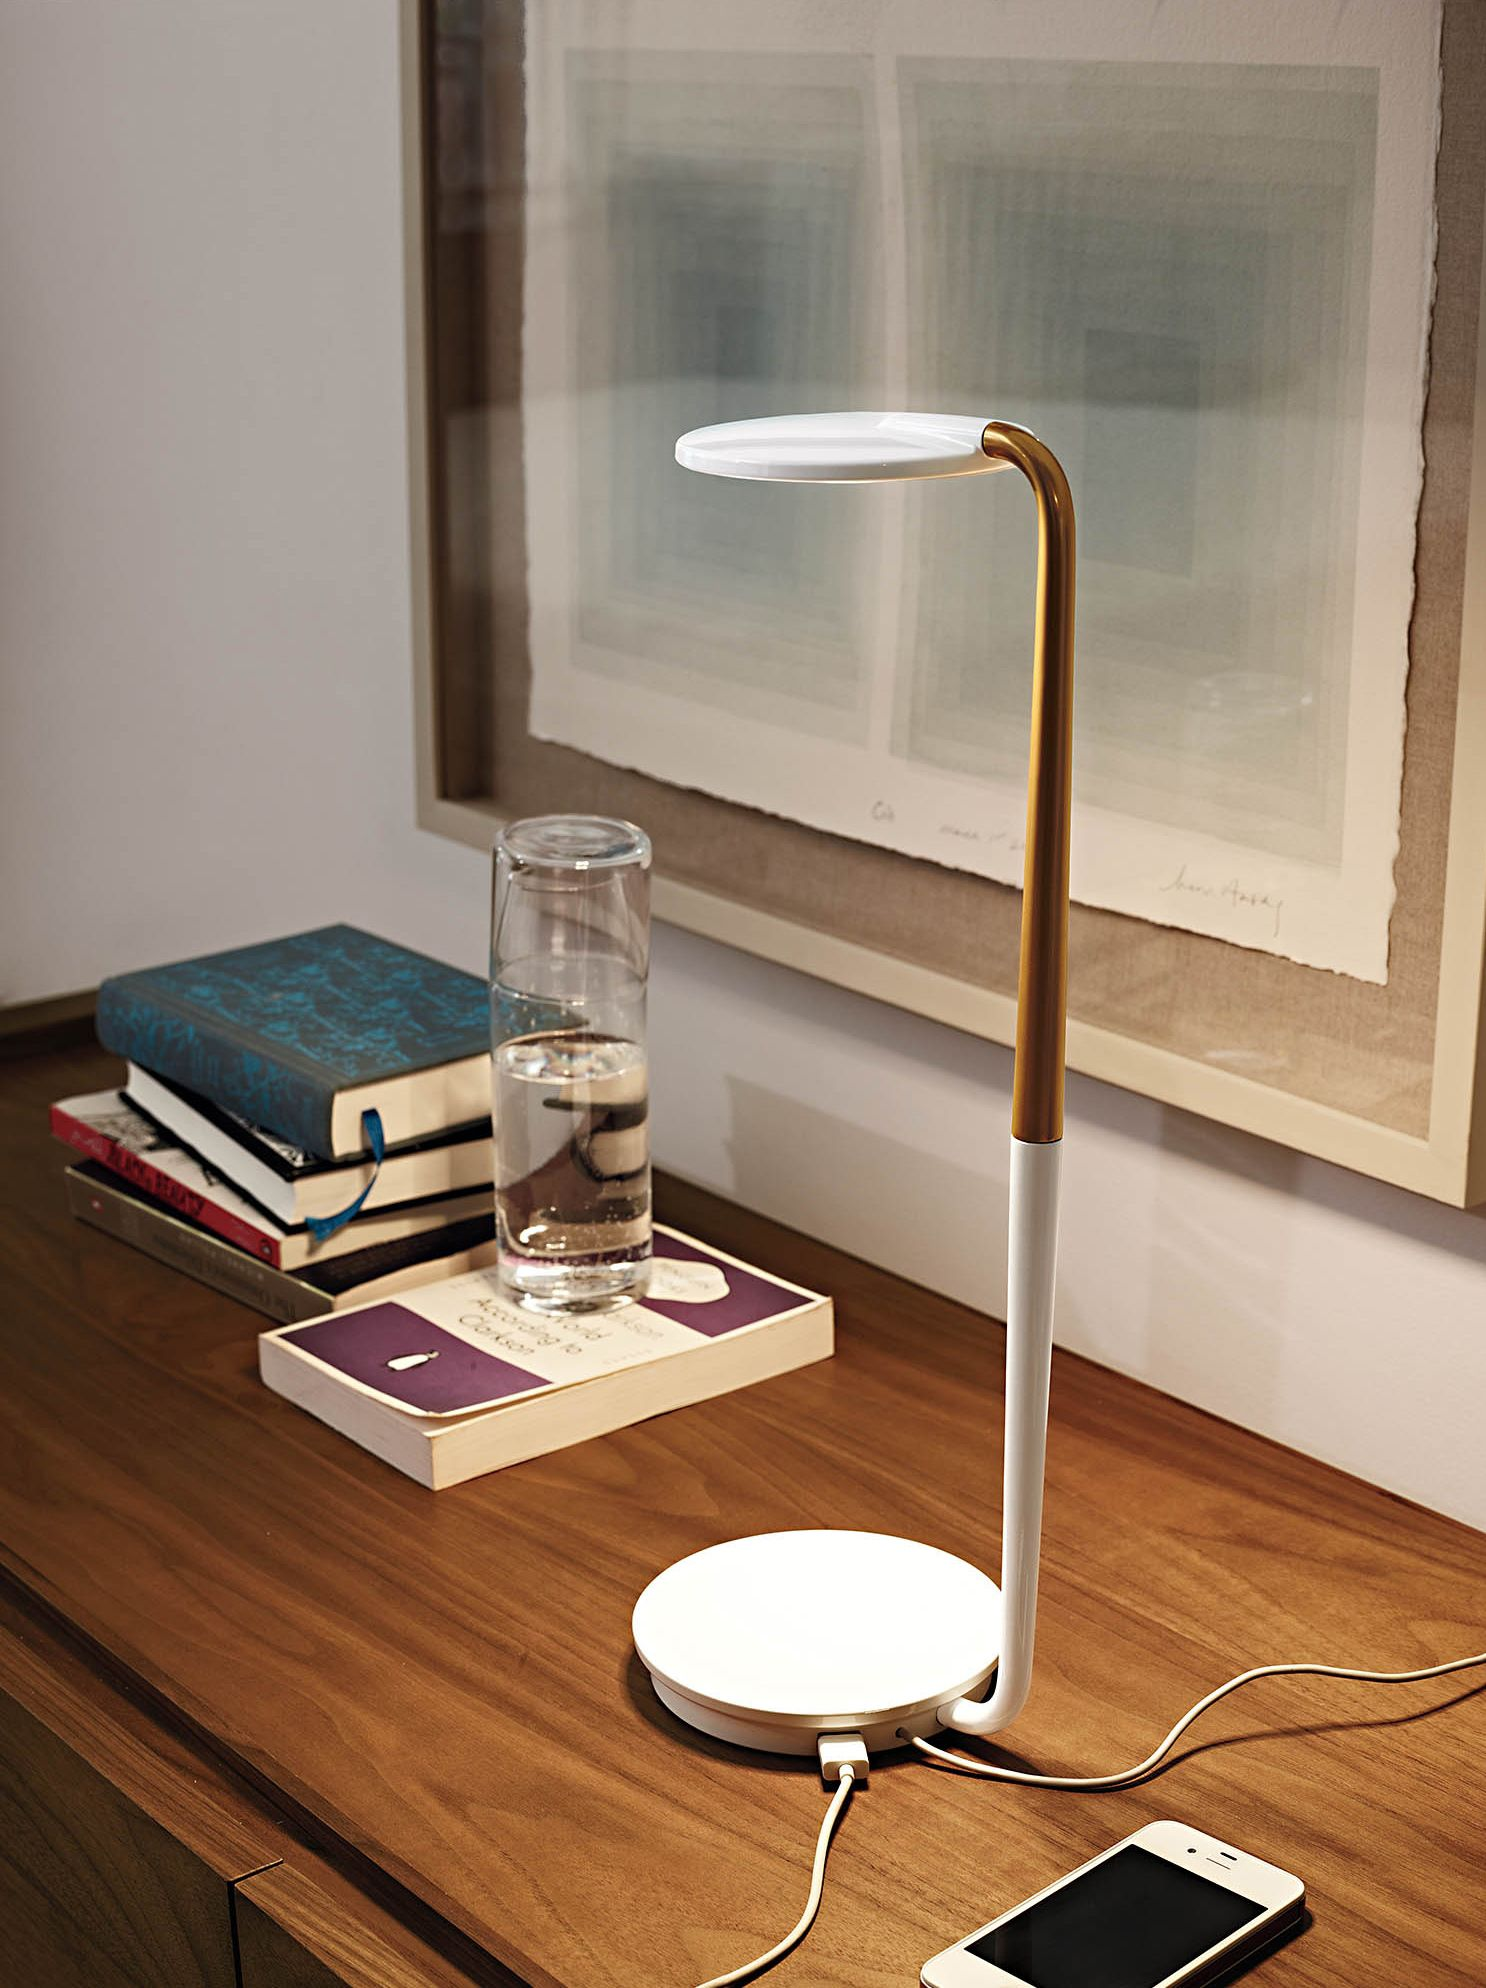 pixo optical led table lamp things for the home table lamp lamp rh pinterest com